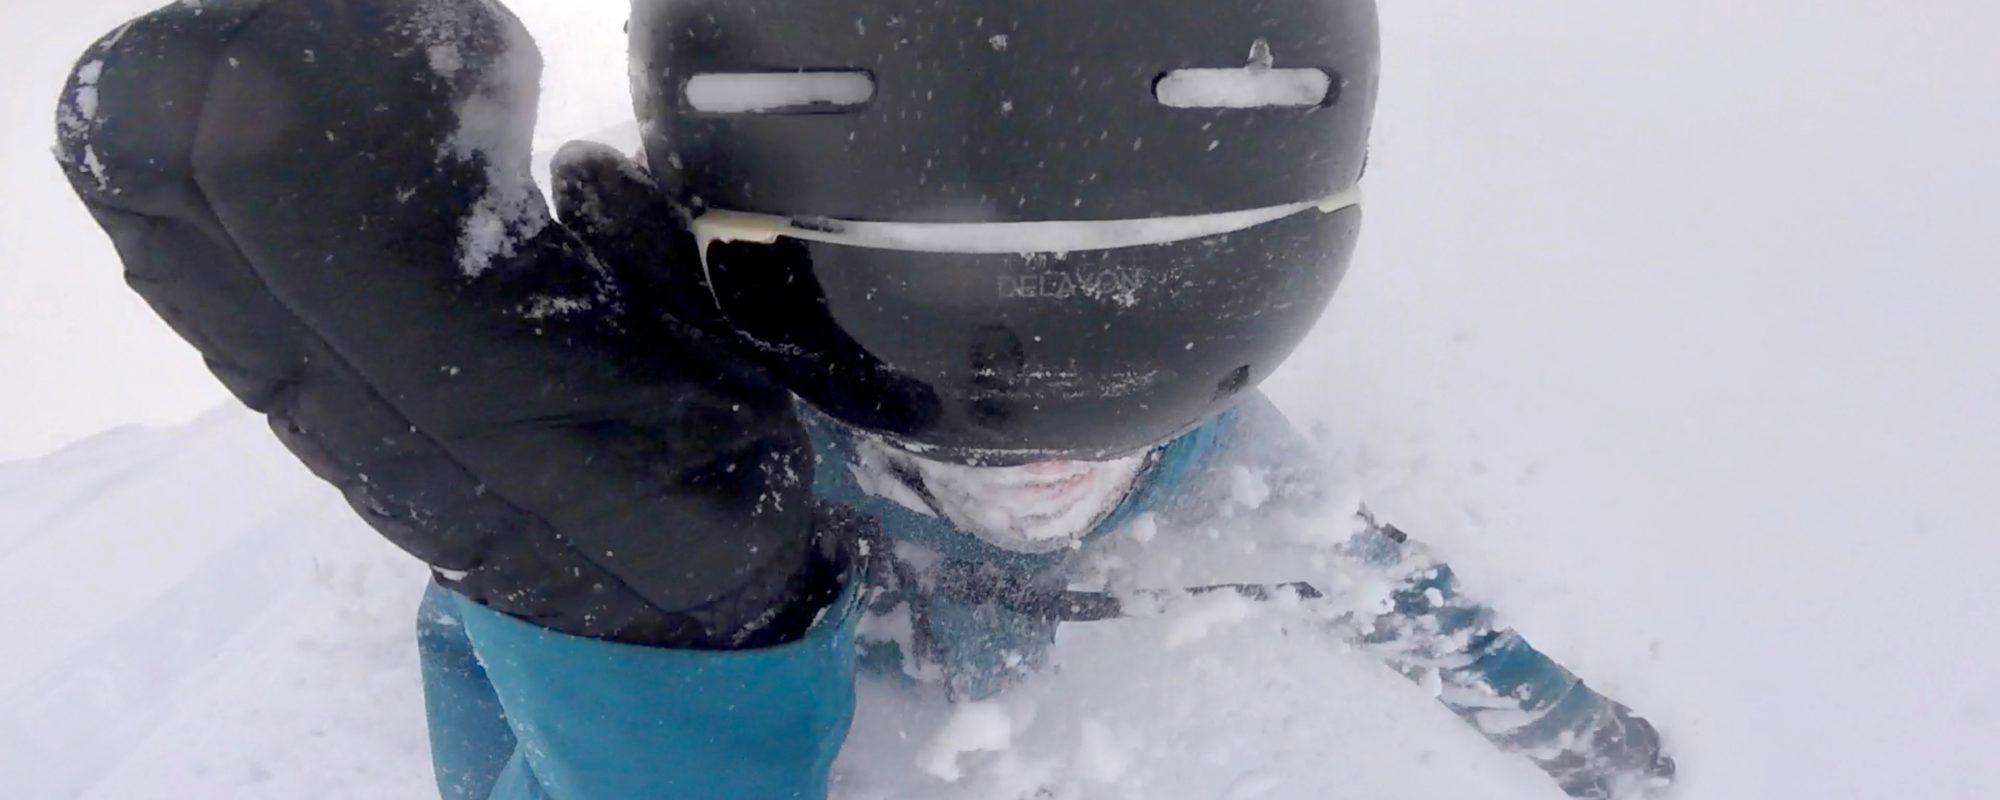 Delayon Eyewear Explorer Goggle Strong Back Scratch resistant ski goggle